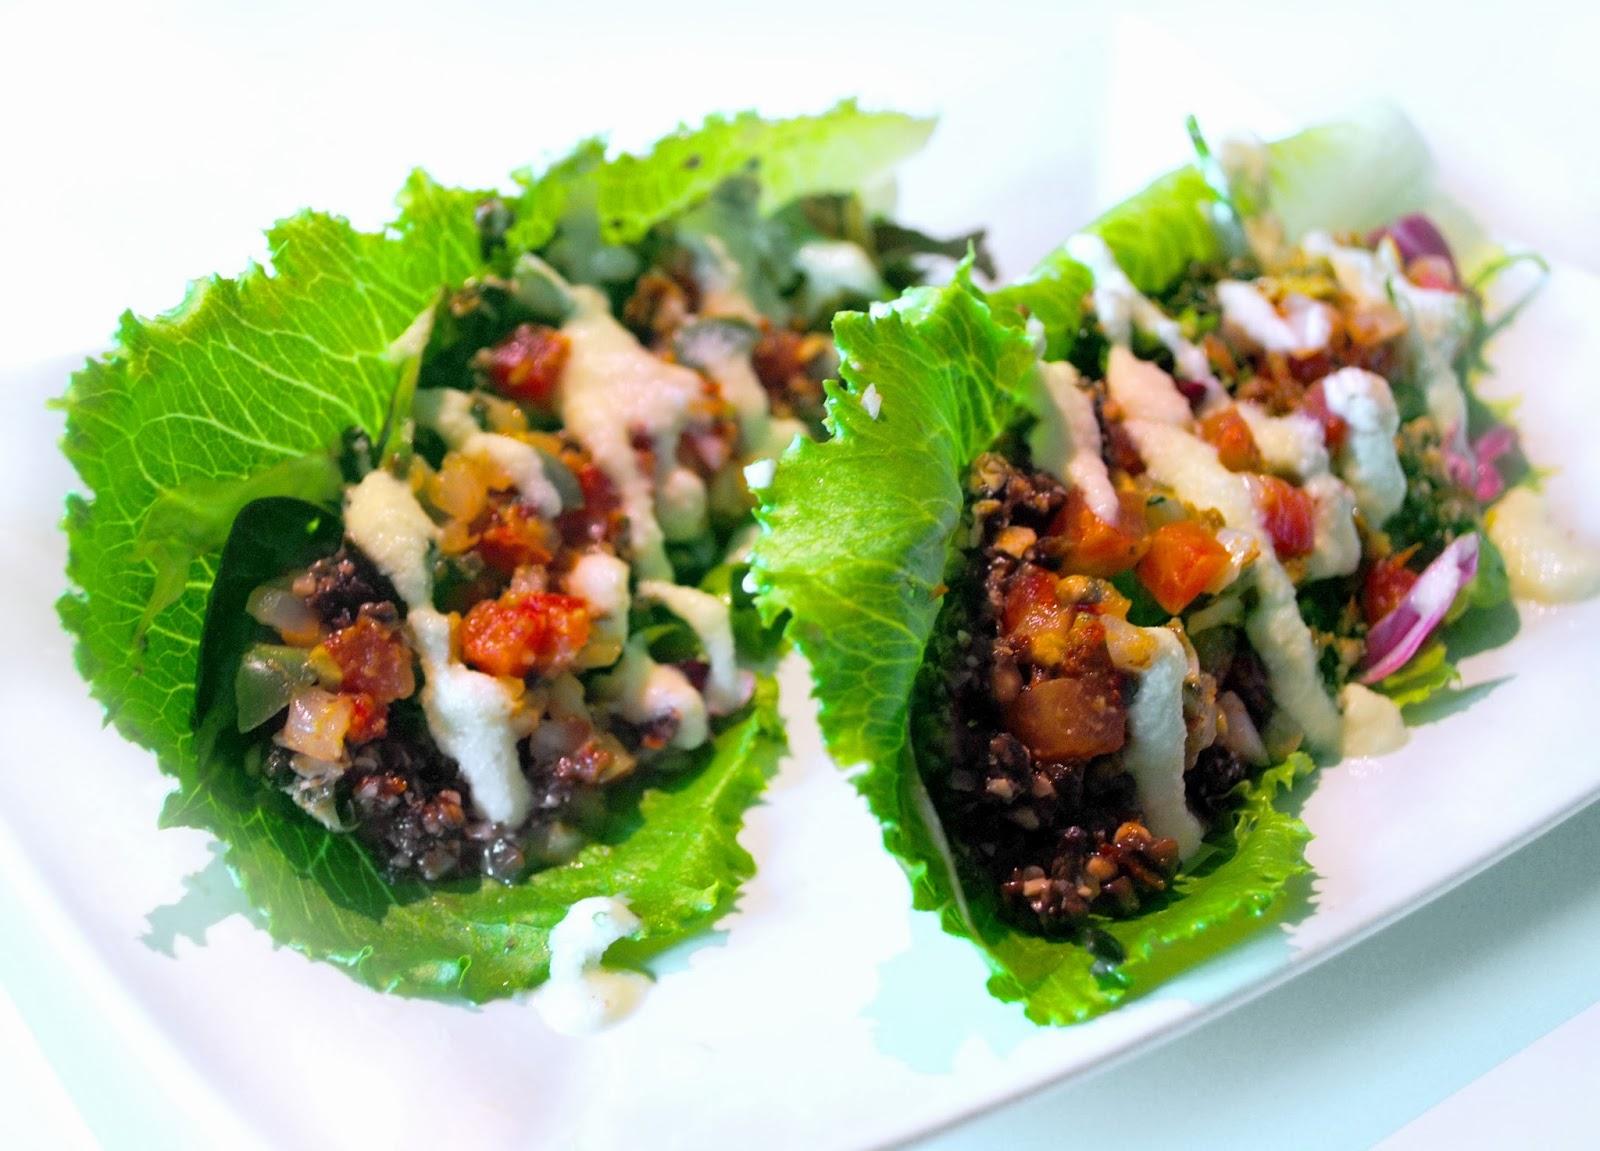 Spiced Blueberry Shake Raw Walnut Tacos With Jalapeno And